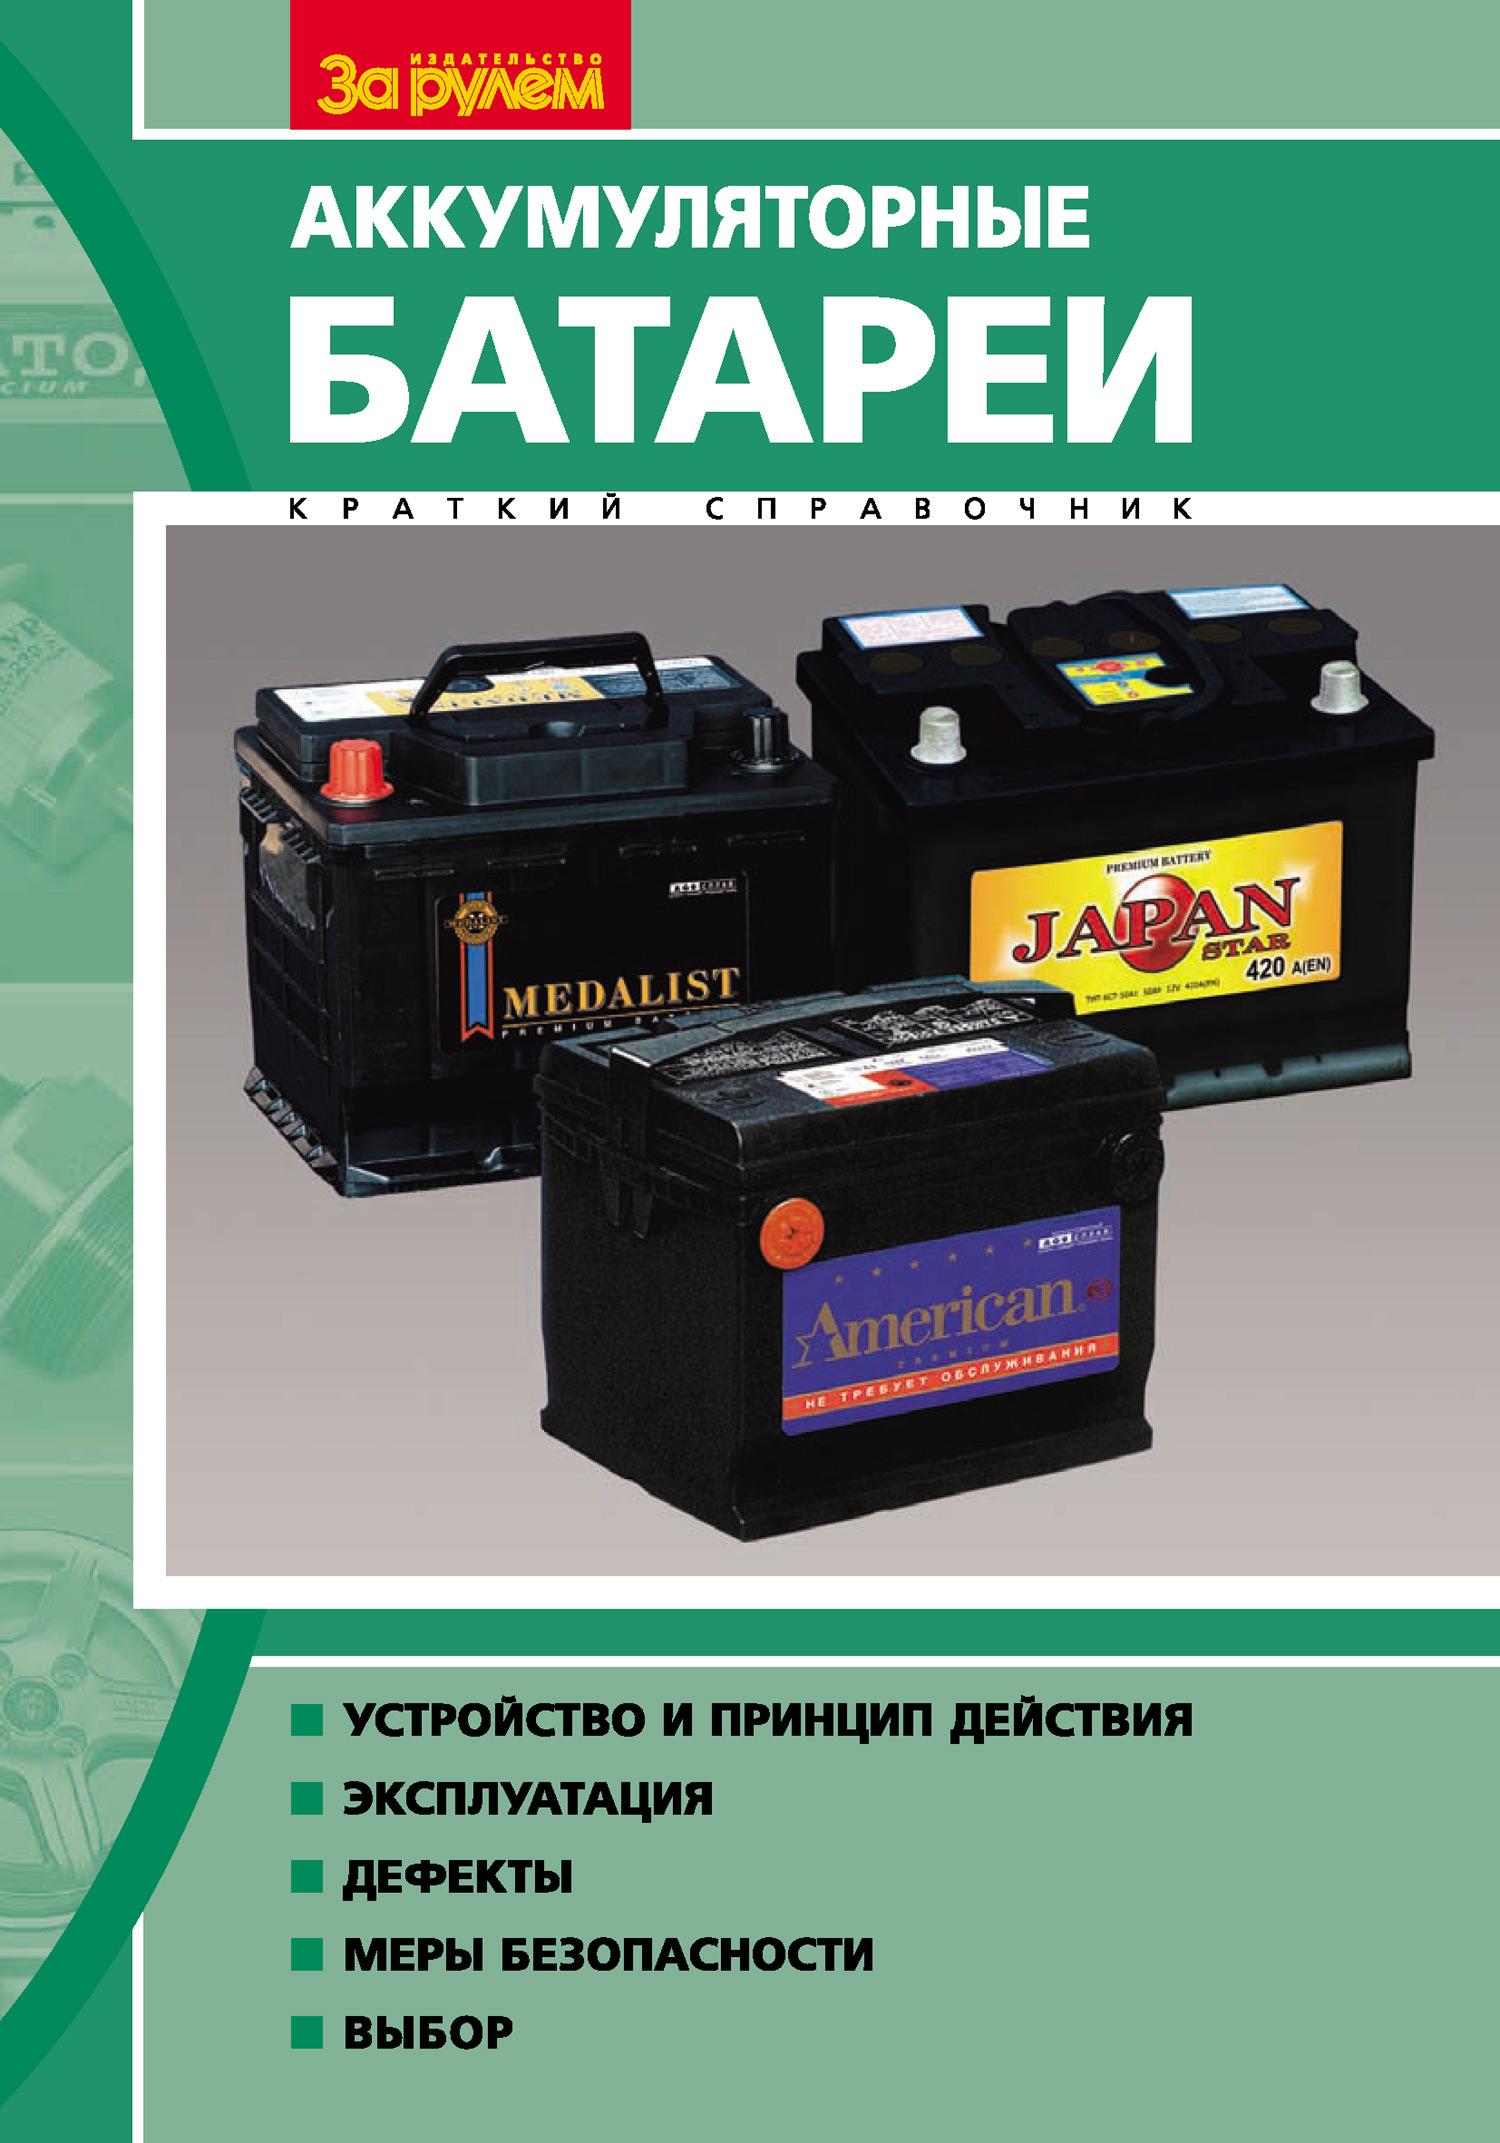 Аккумуляторные батареи. Краткий справочник